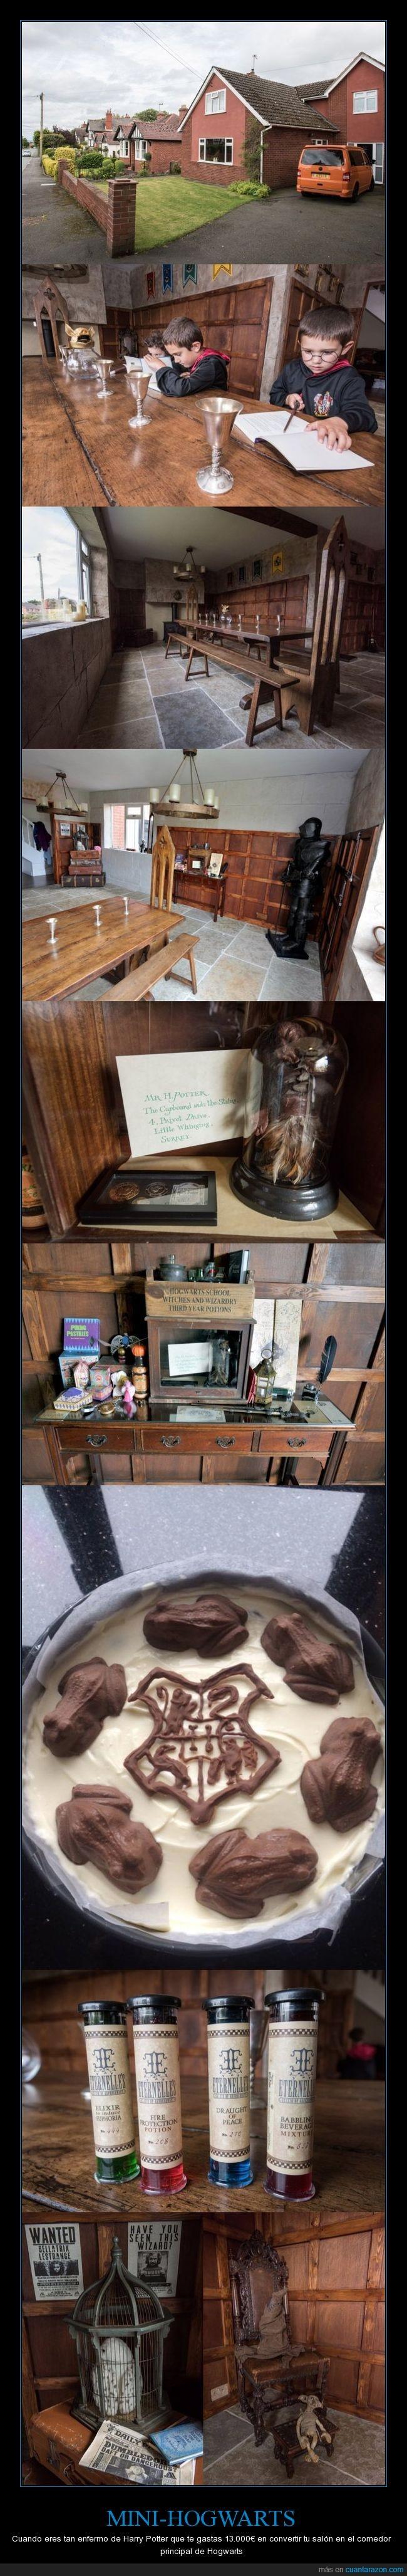 casa,harry potter,hogwarts